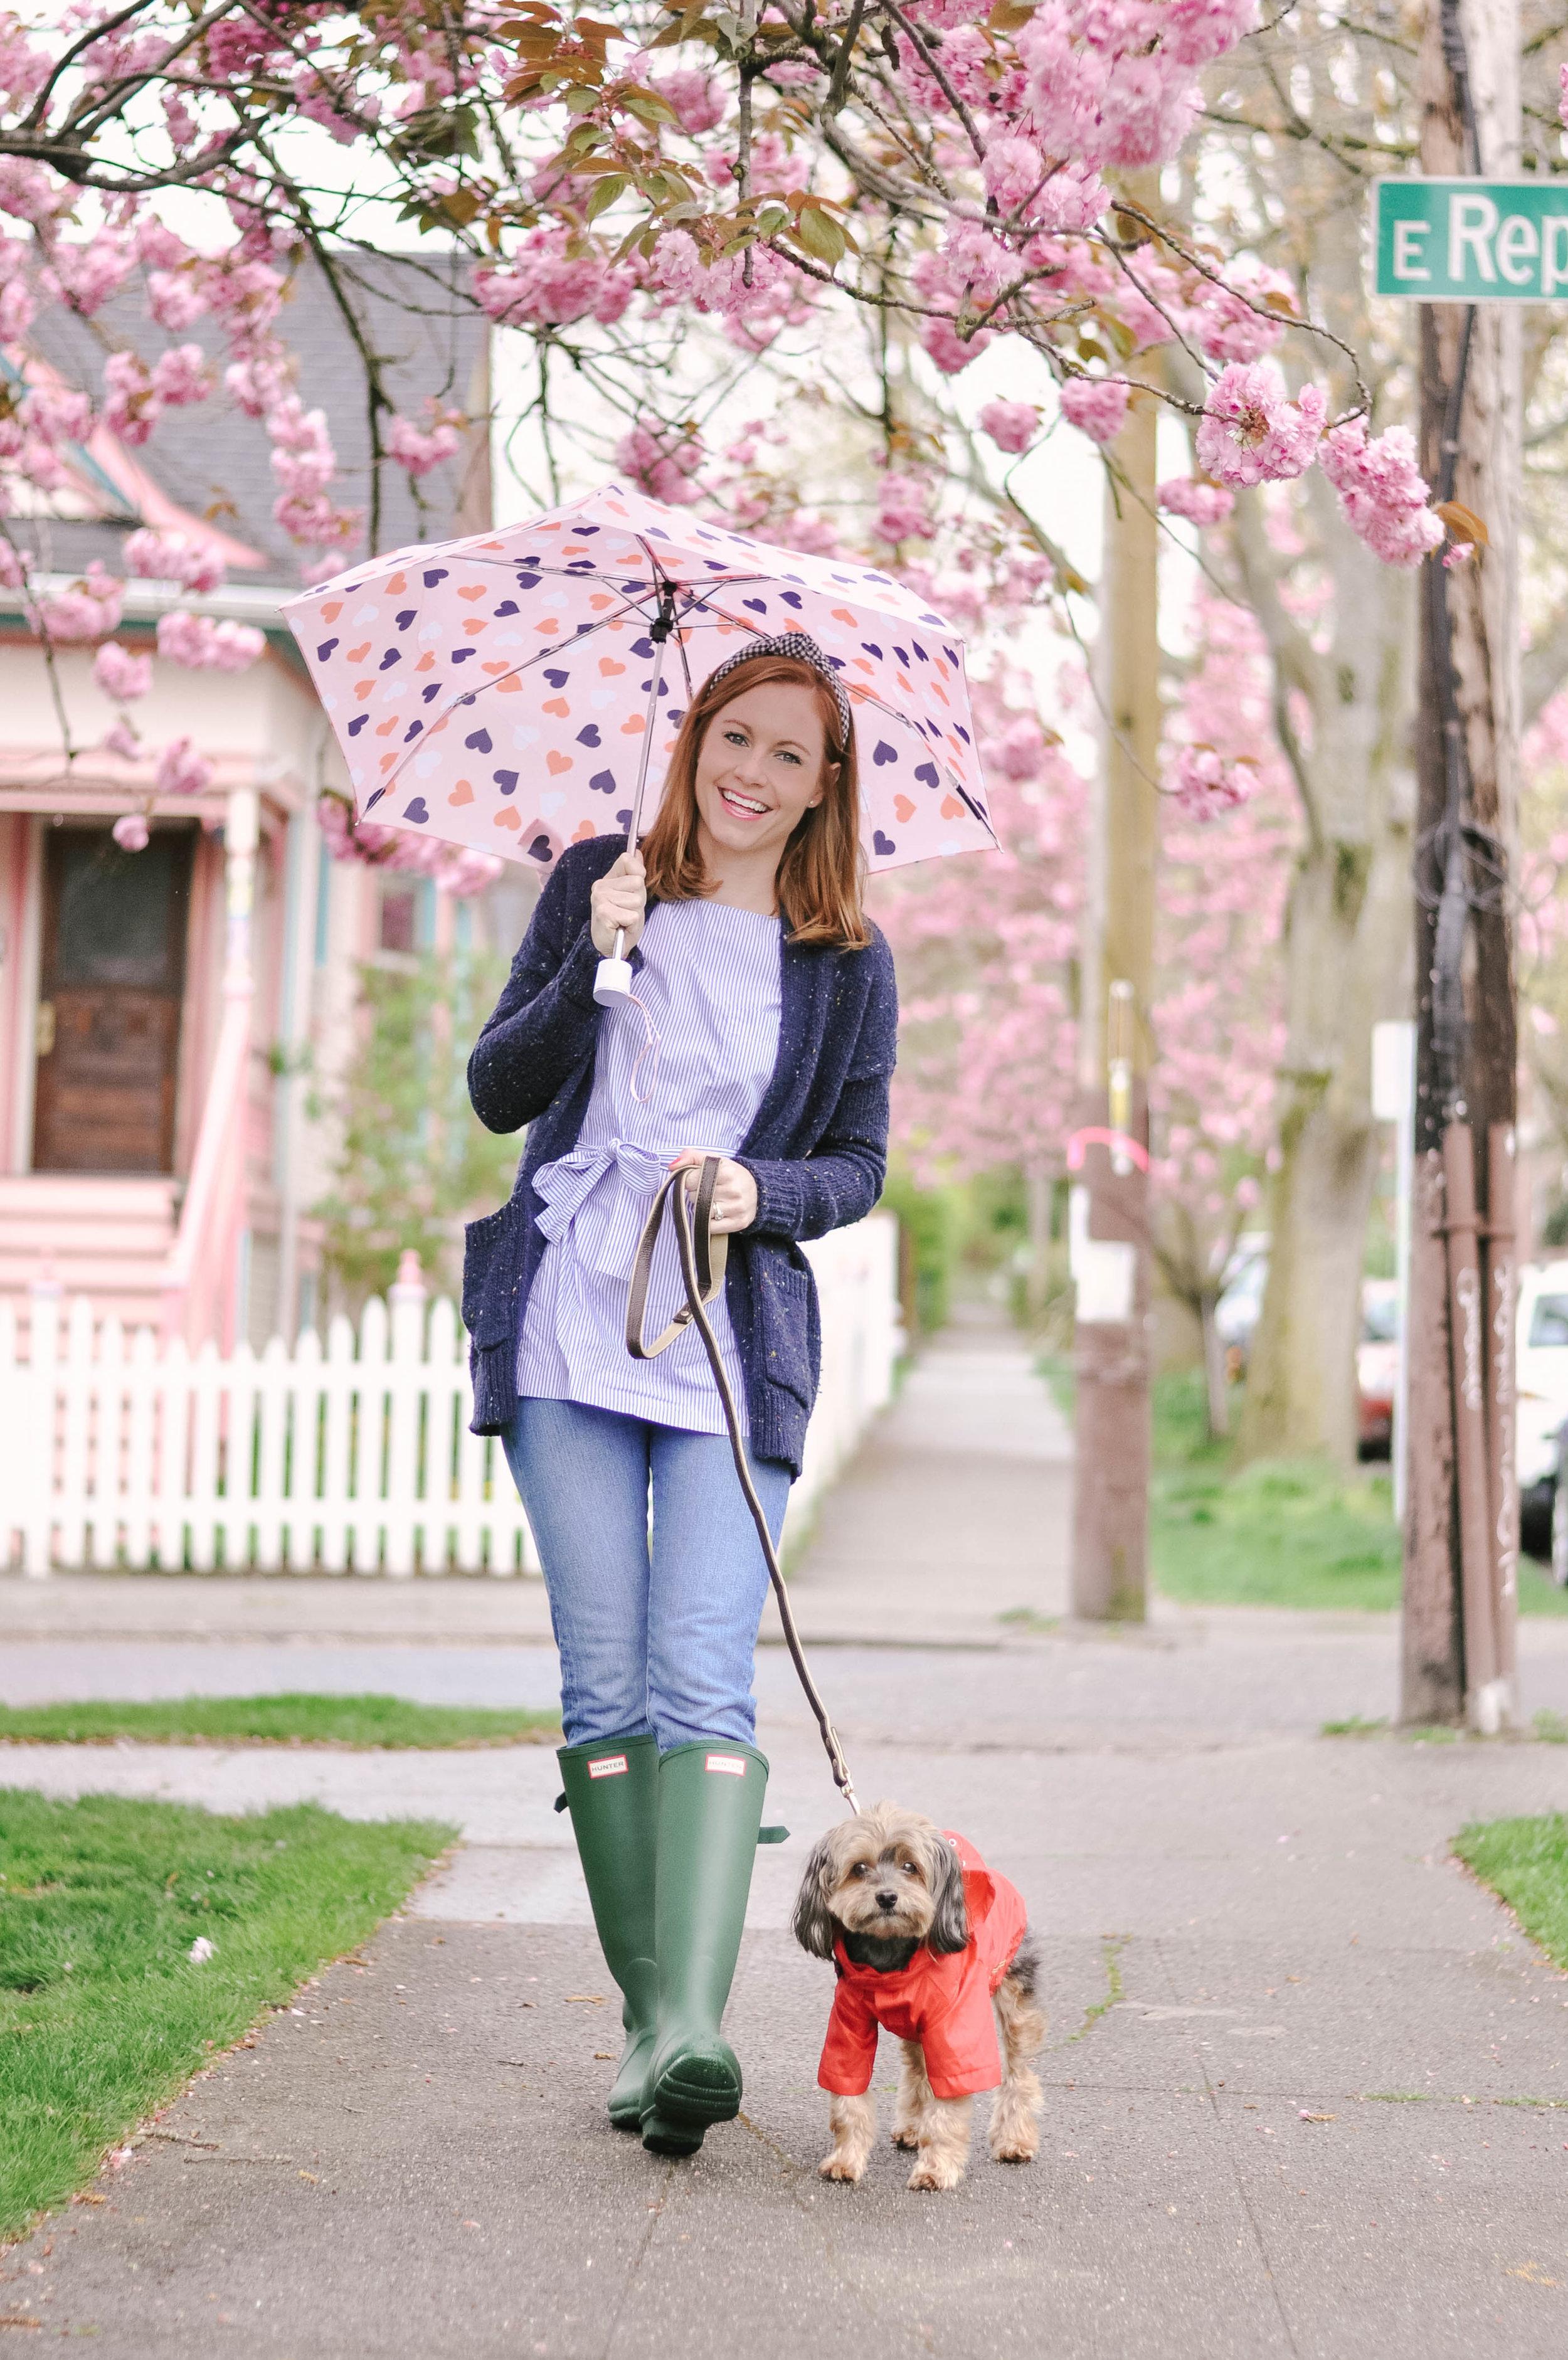 Woman walking dog in raincoat